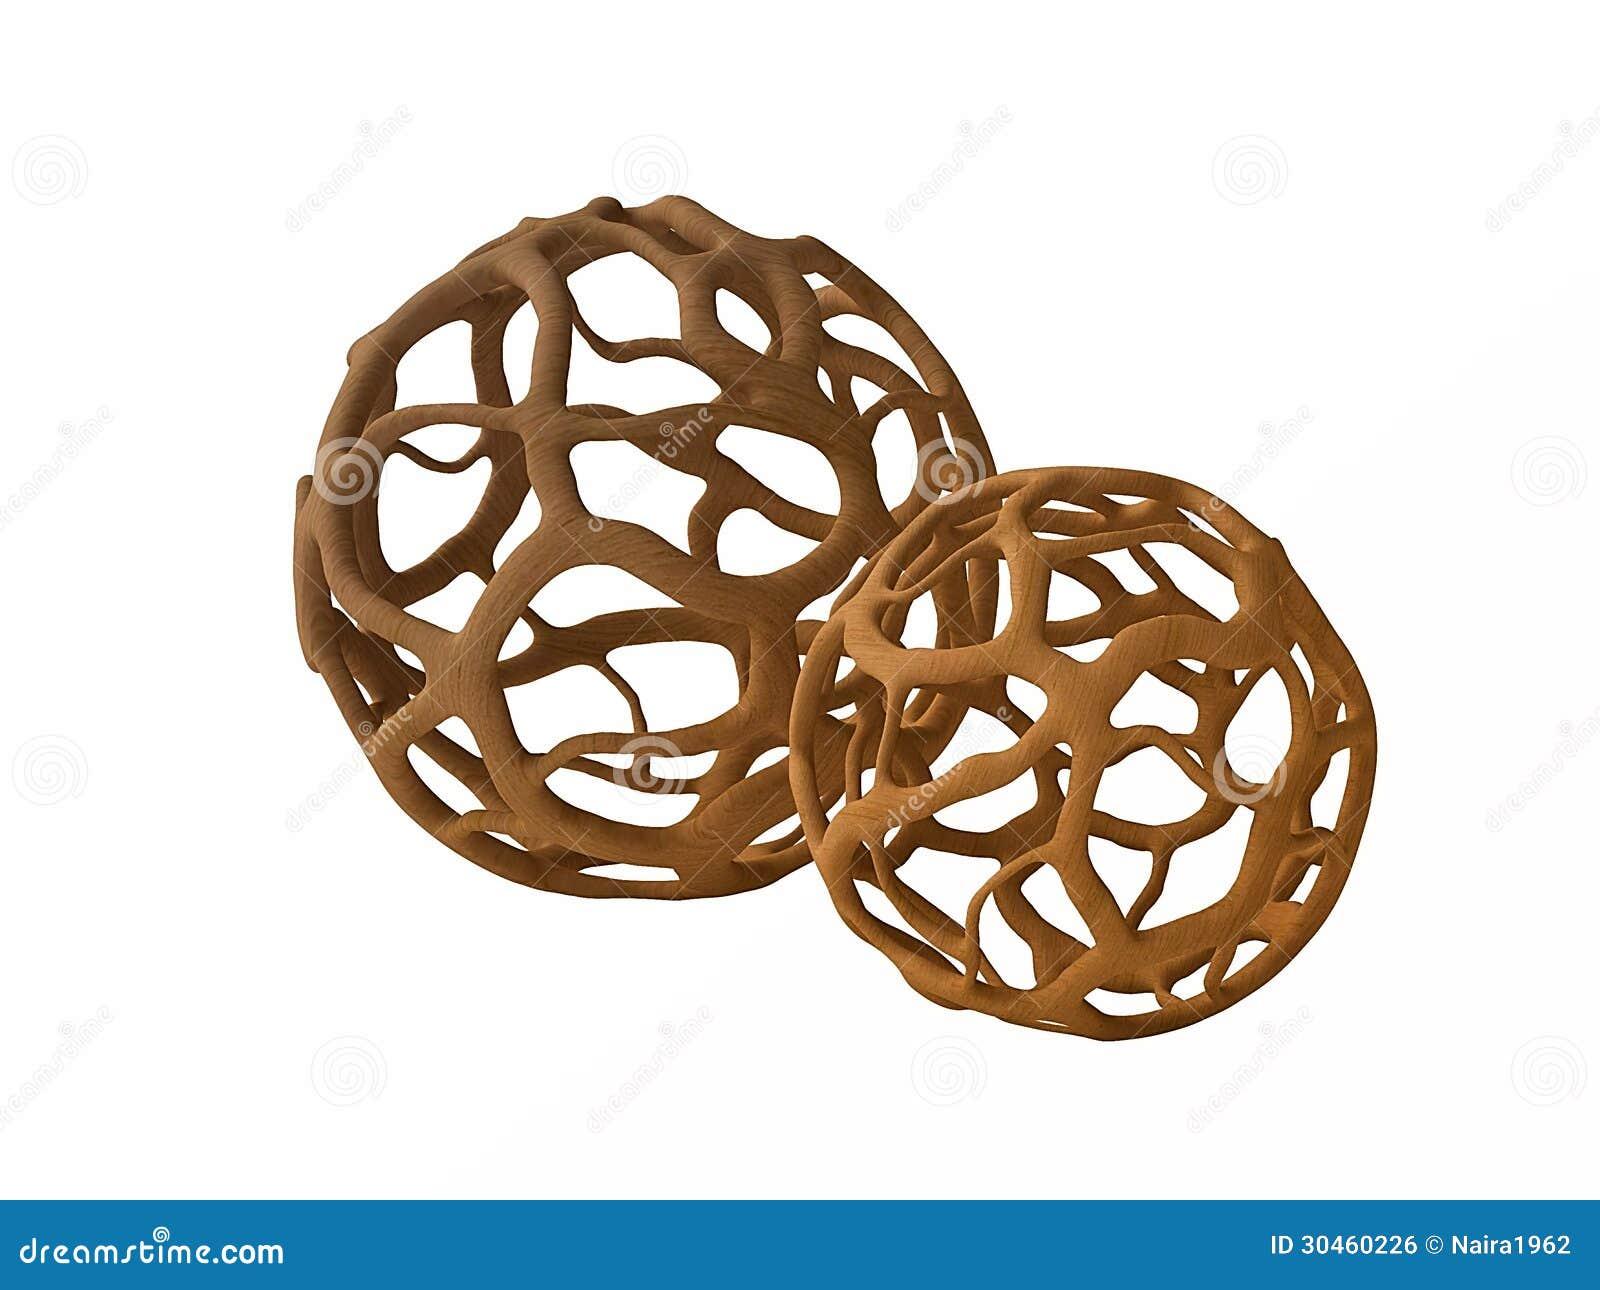 Spherical Wooden Objects For Interior Design Stock Illustration